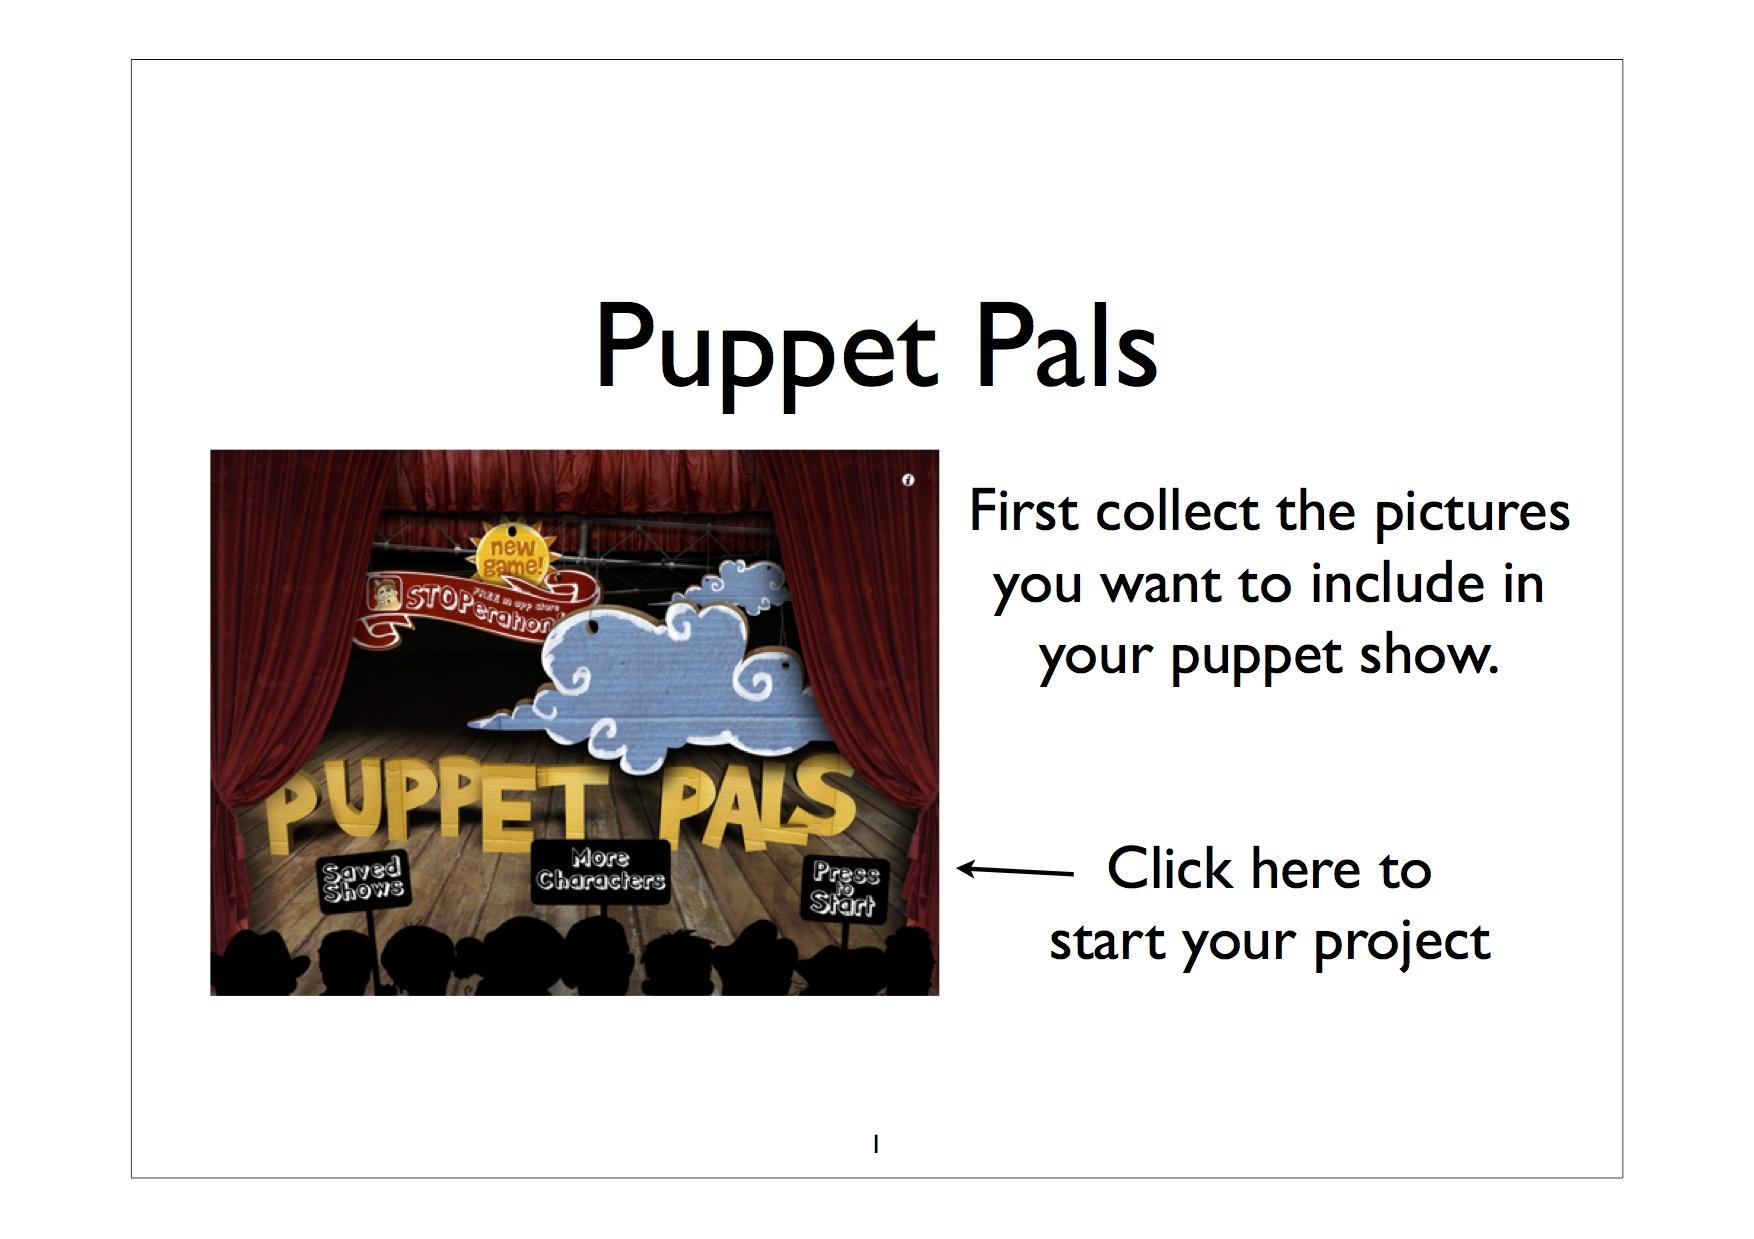 puppet pals badge - abingdon